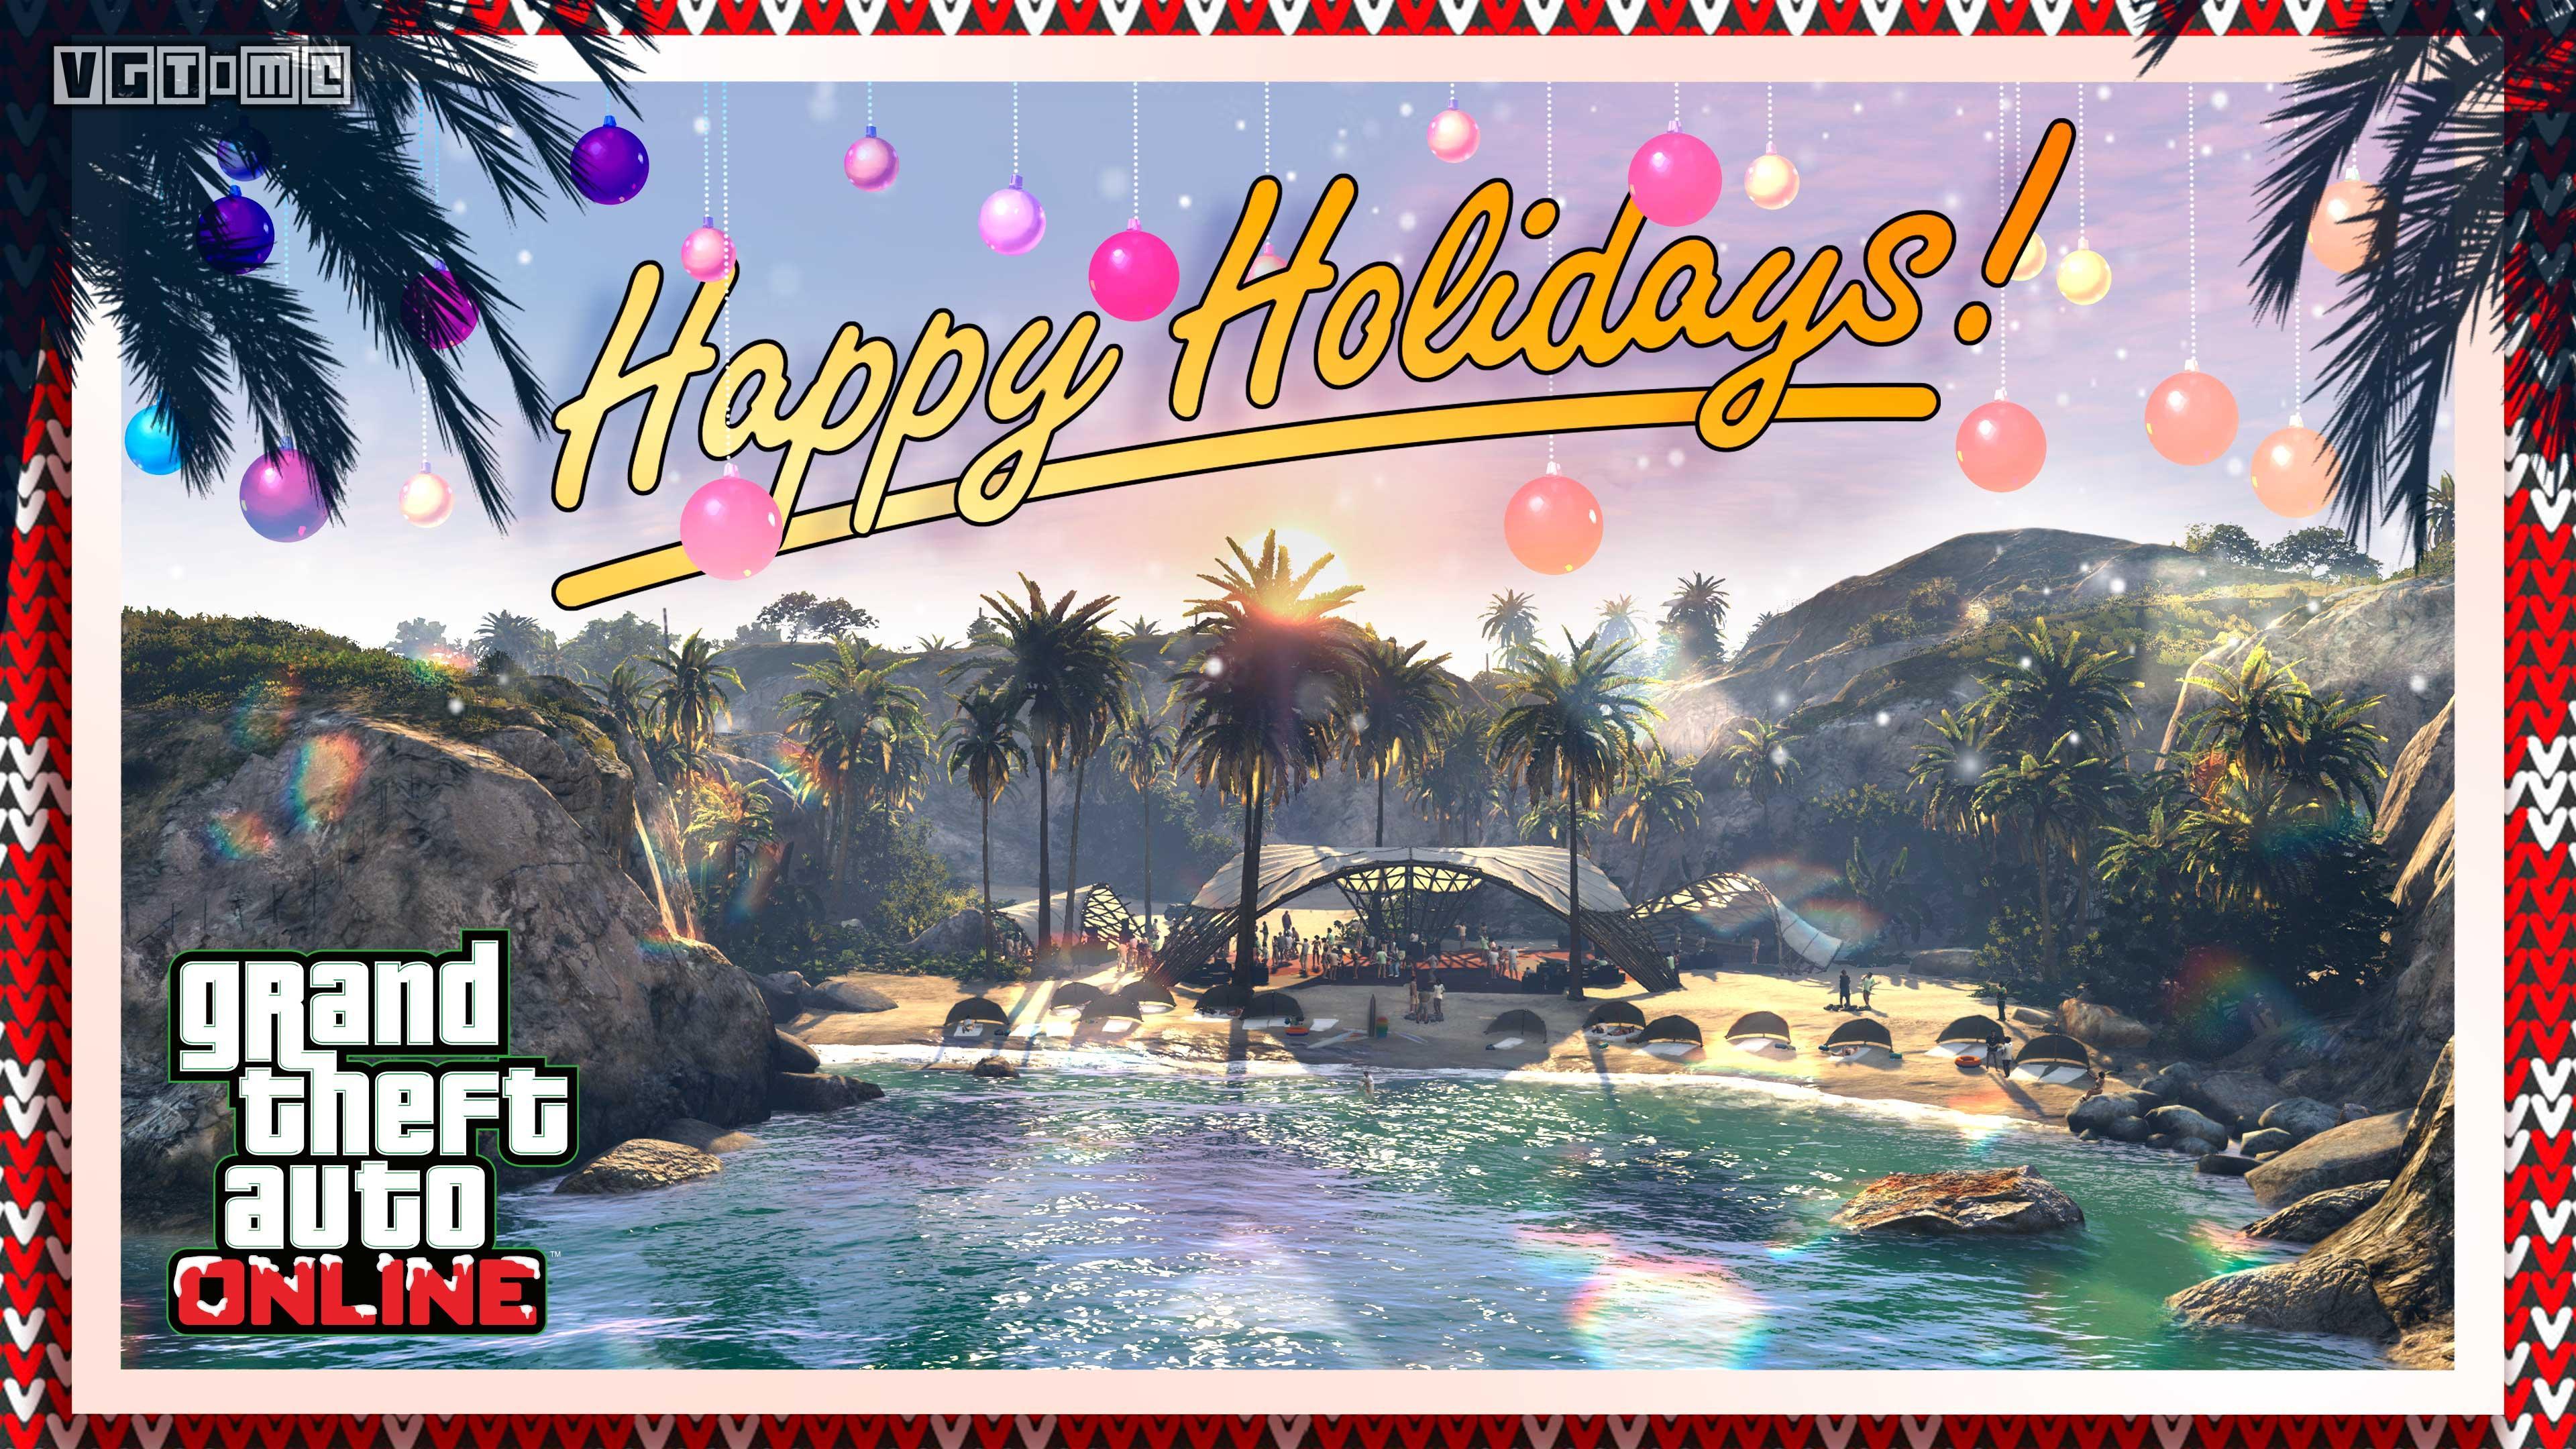 《GTA Online》圣诞活动和全新音乐柜演出现已开启